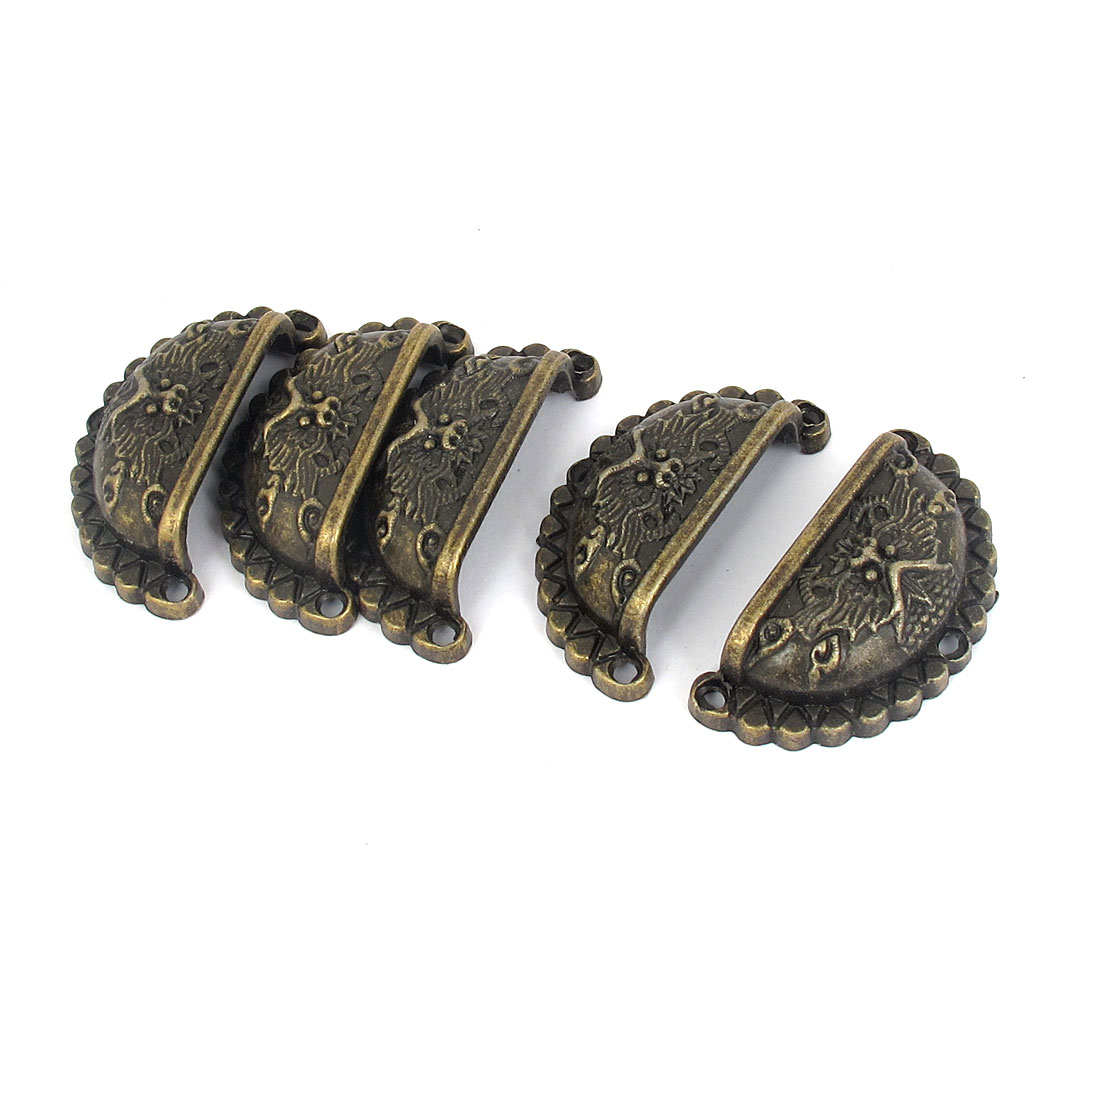 Wardrobe Cabinet Bin Retro Style Embossed Metal Door Pull Handle Knob Bronze Tone 5pcs